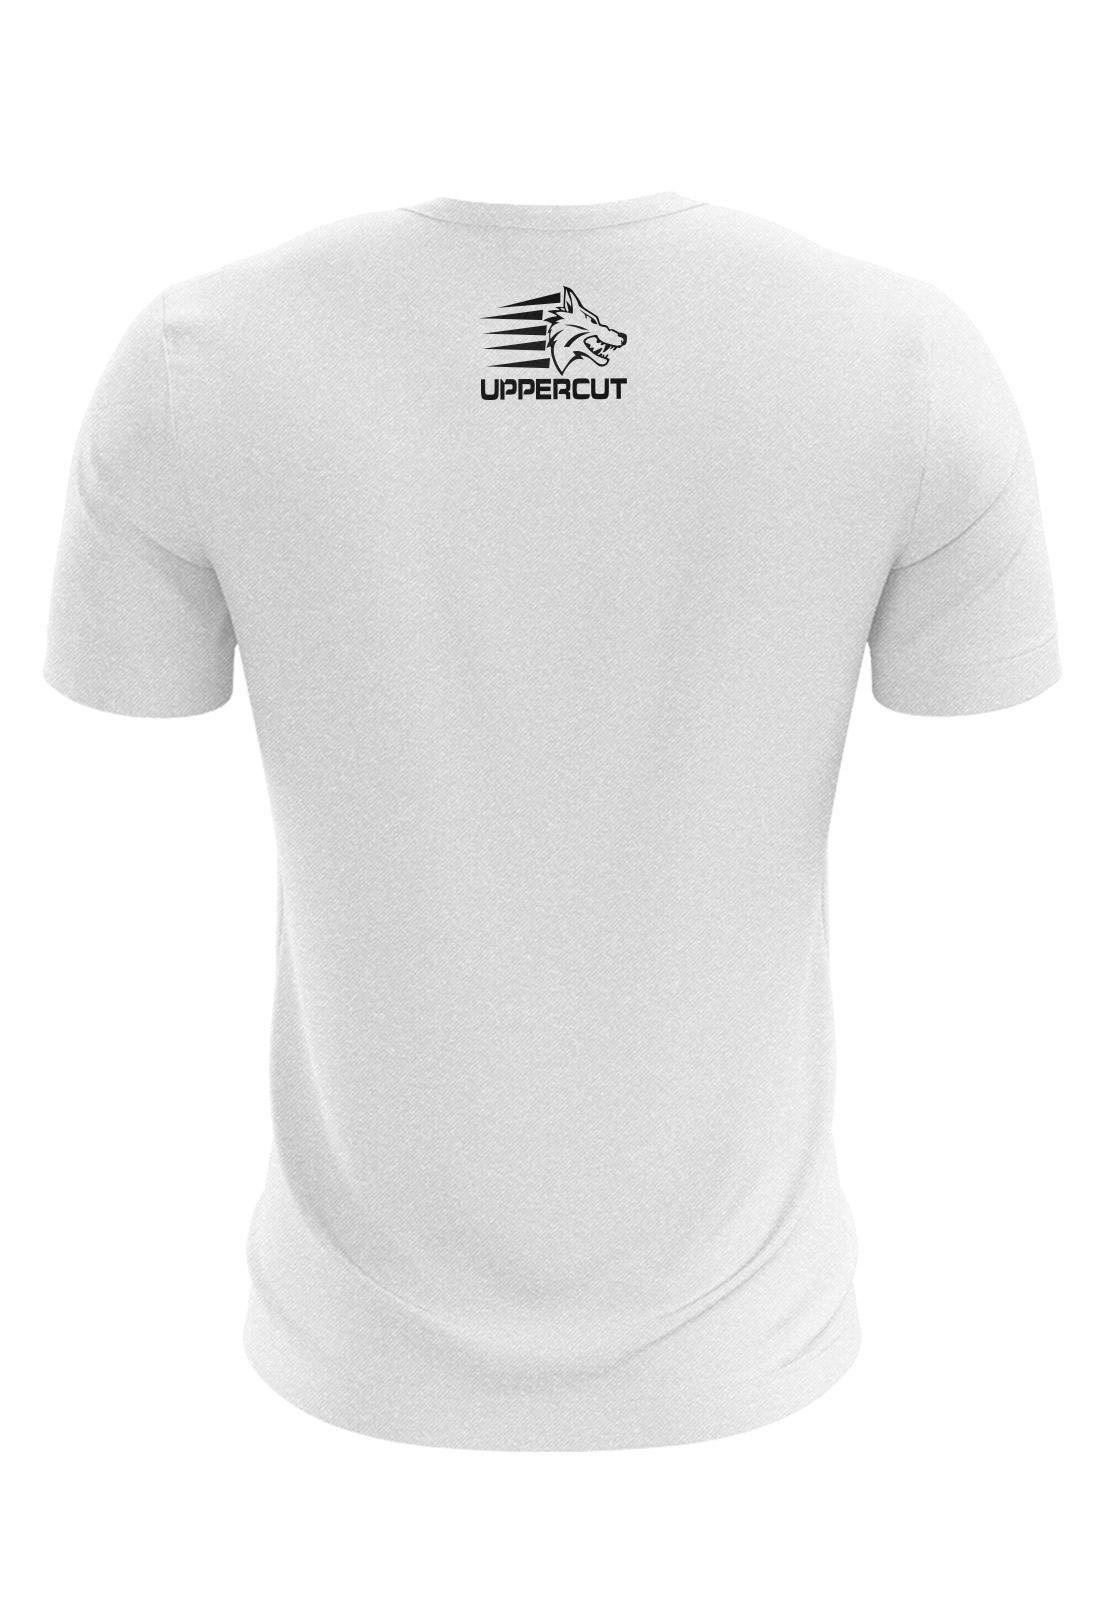 Kit 2 Camisas Dry Fit Proteção Solar - UV50+ Futebol - Kt46